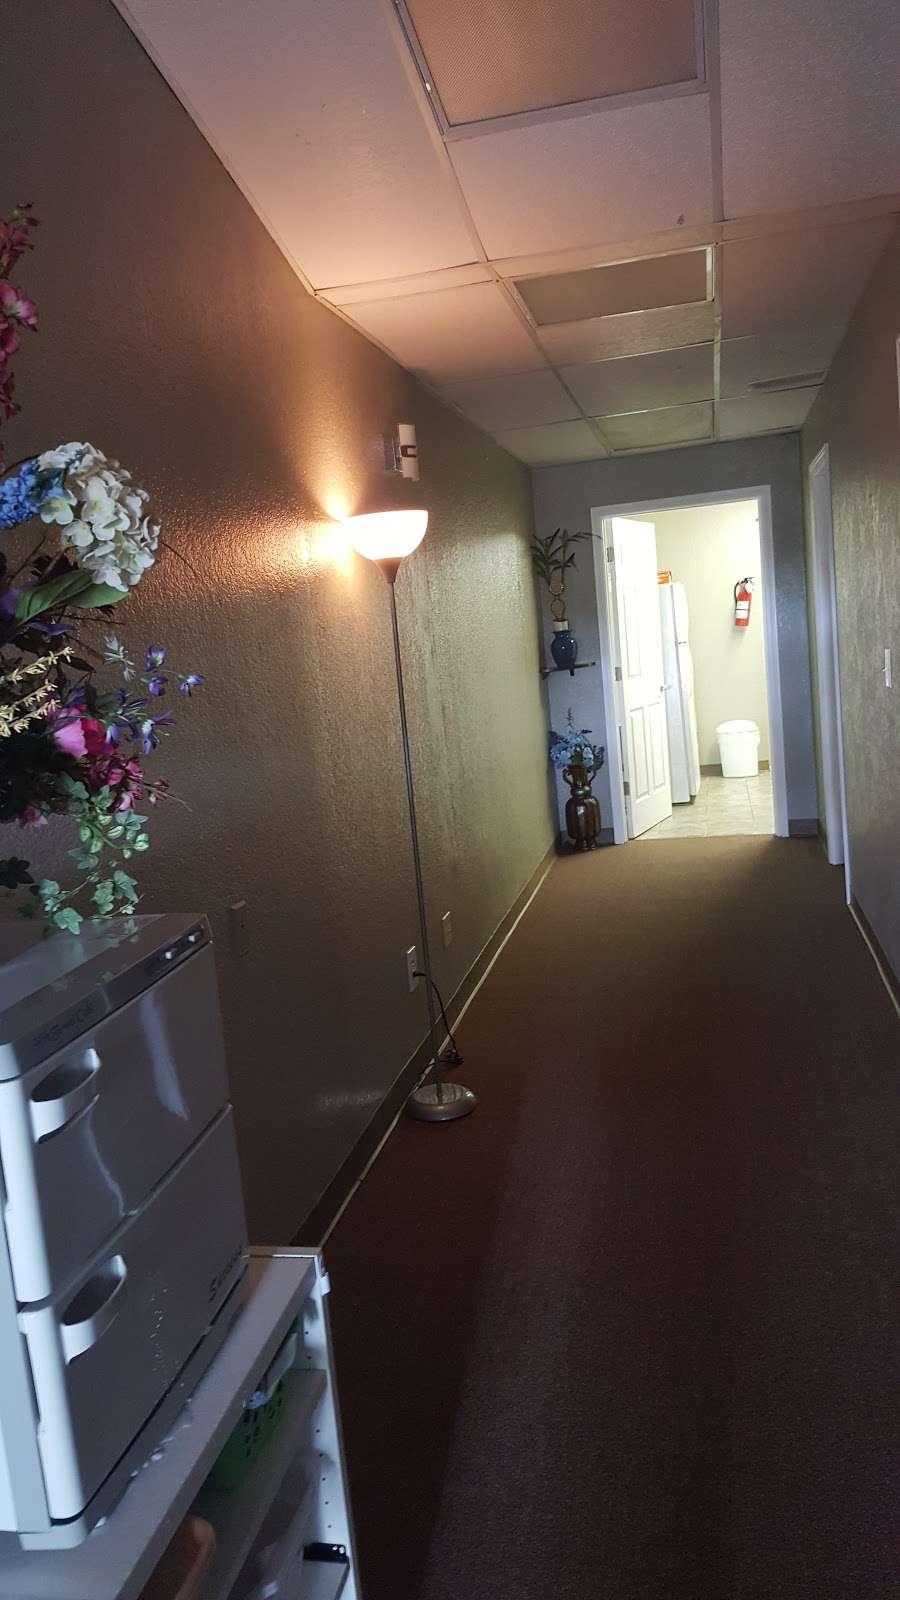 A+ Foot Spa - spa  | Photo 10 of 10 | Address: 9323 Perrin Beitel Rd #104, San Antonio, TX 78217, USA | Phone: (210) 590-1221